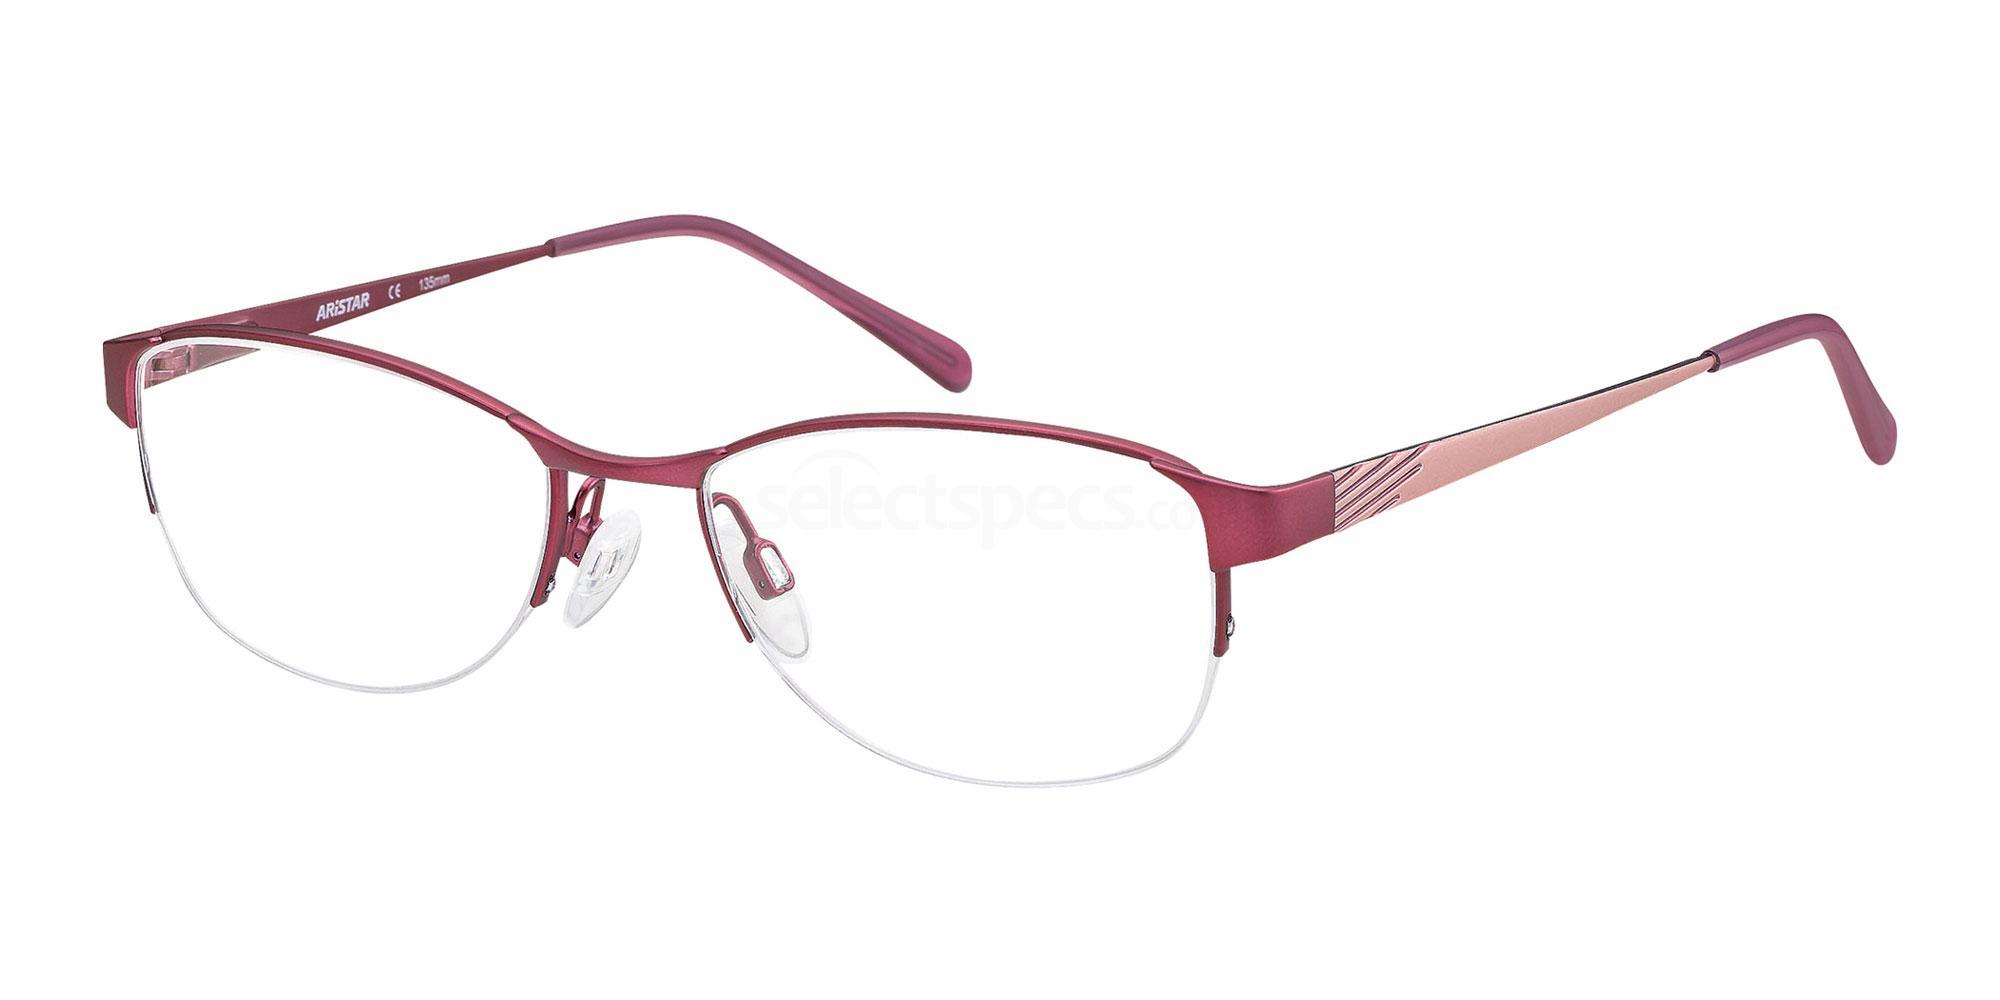 515 AR16374 Glasses, Aristar